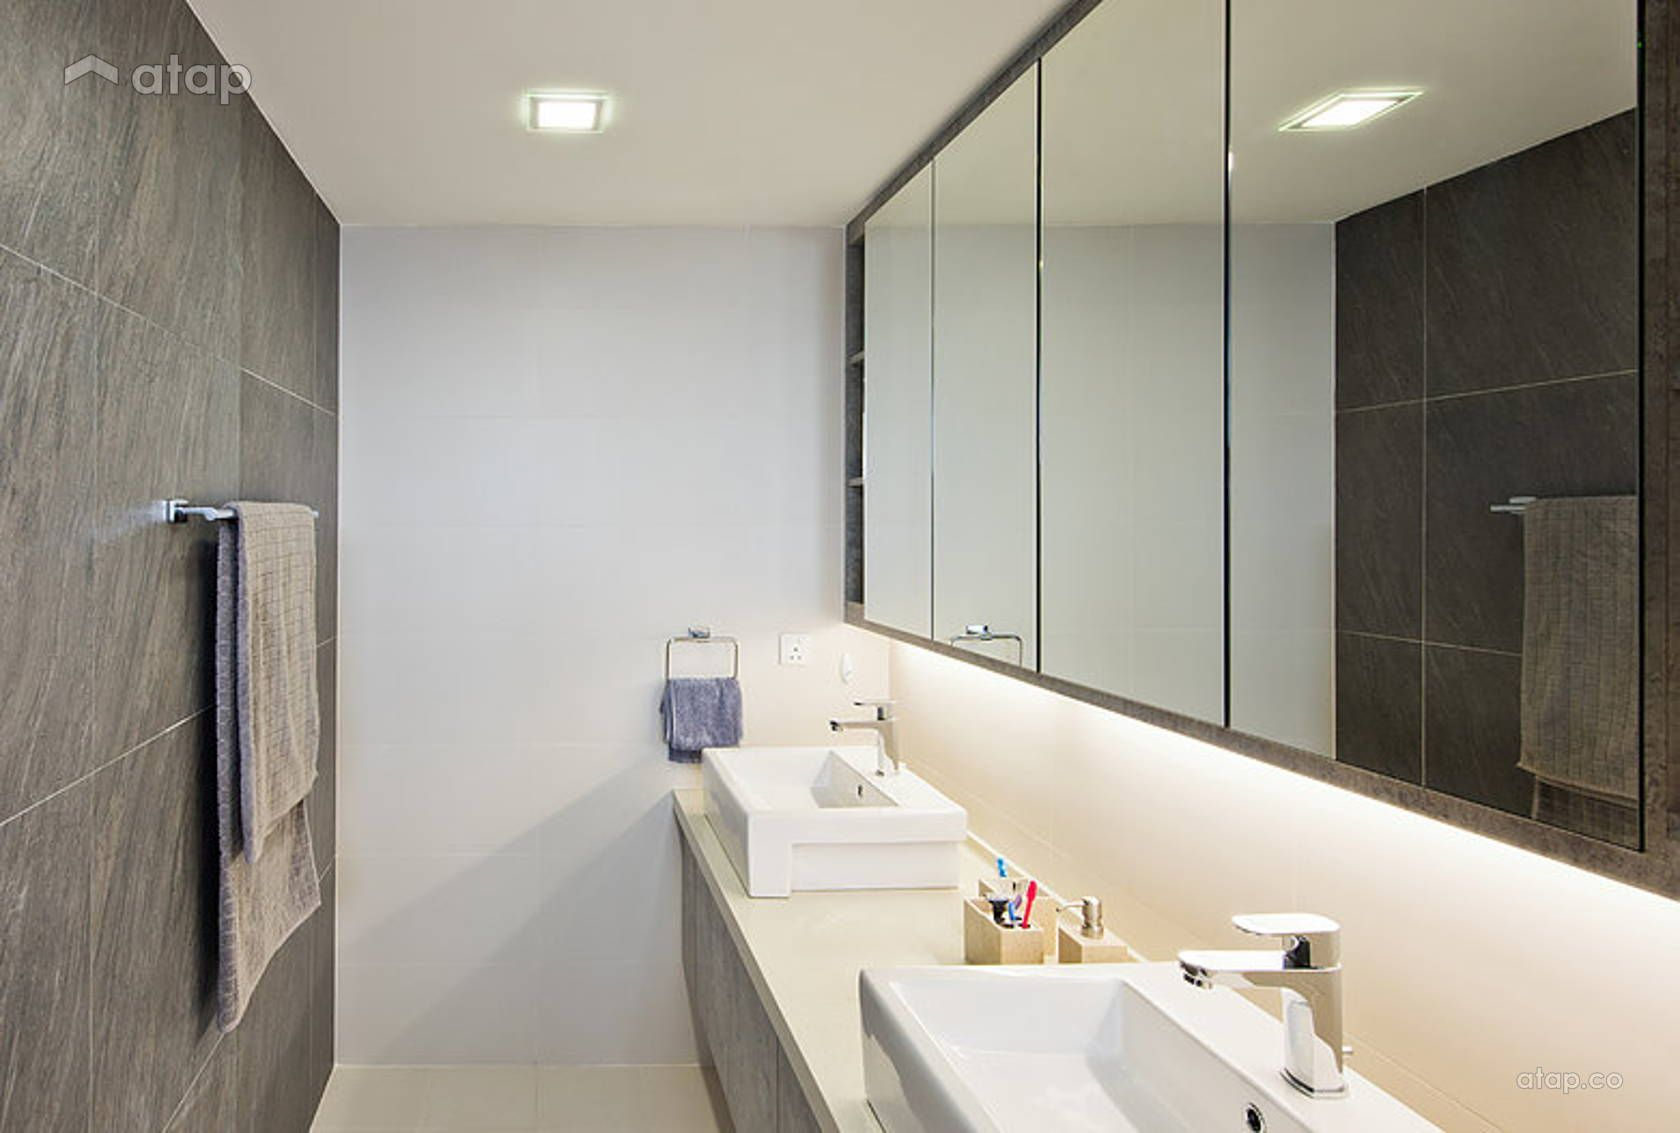 Contemporary Modern Bathroom Condominium Design Ideas Photos Malaysia Atap Co Condominium Design Bathroom Interior Design Modern Bathroom